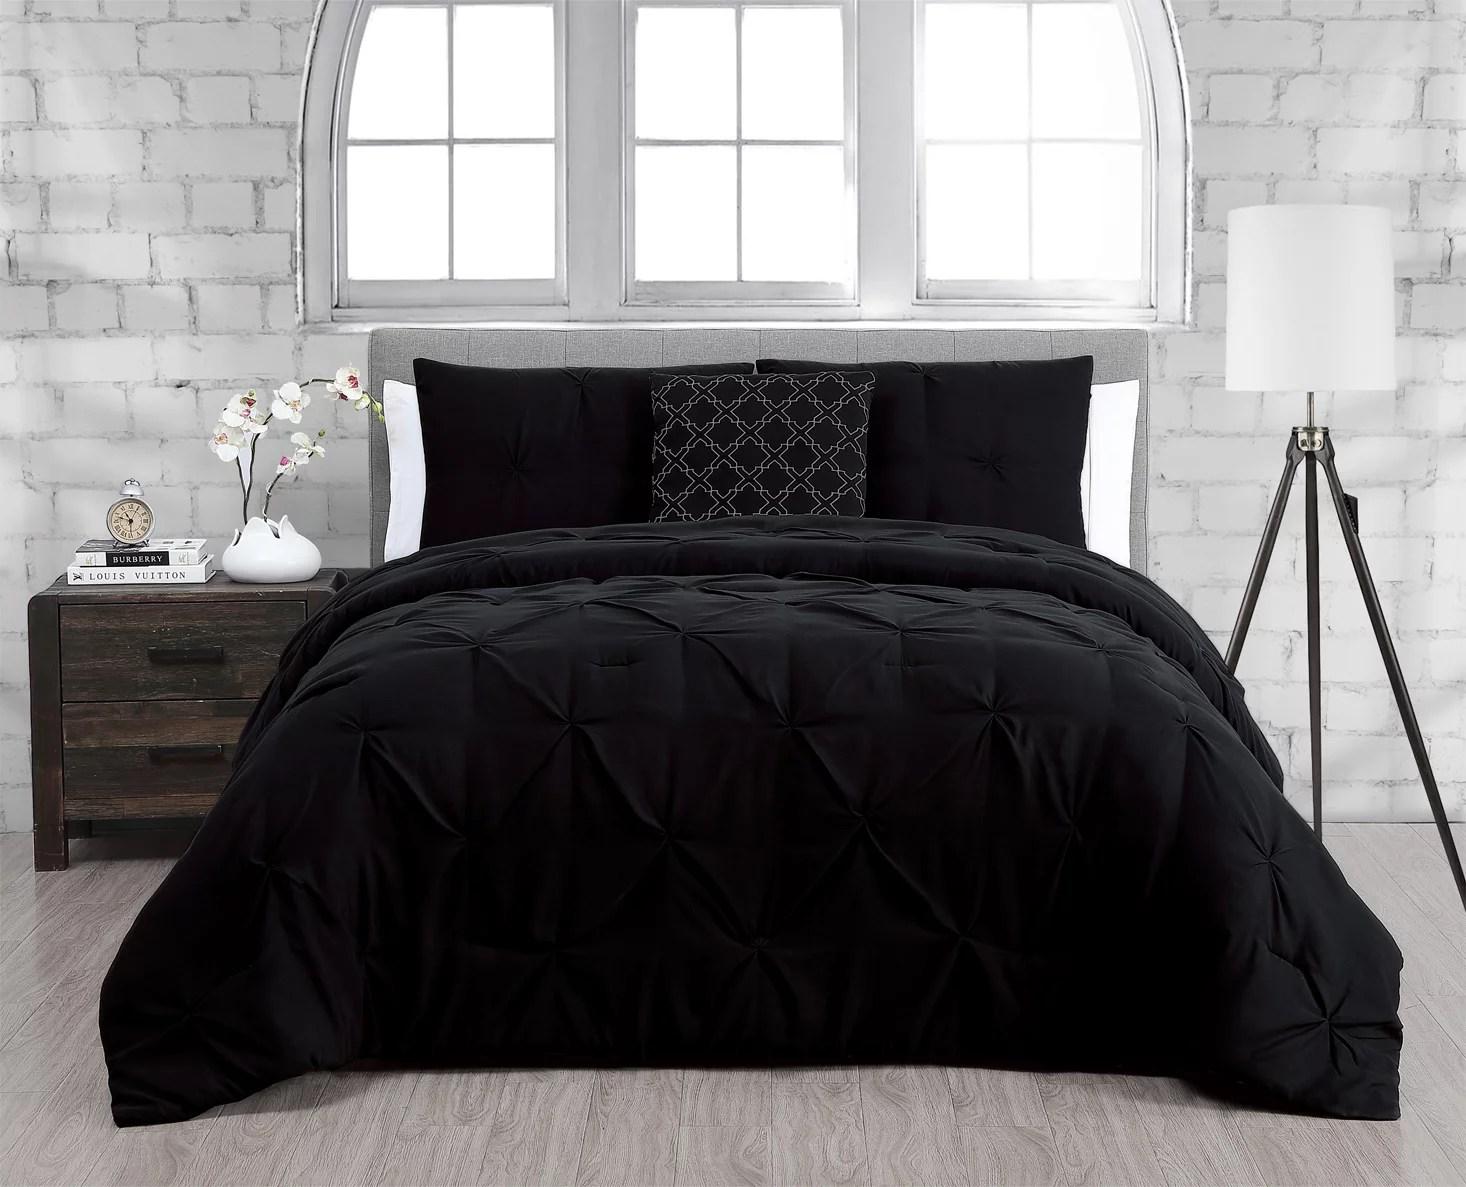 bed comforters comforter sets king